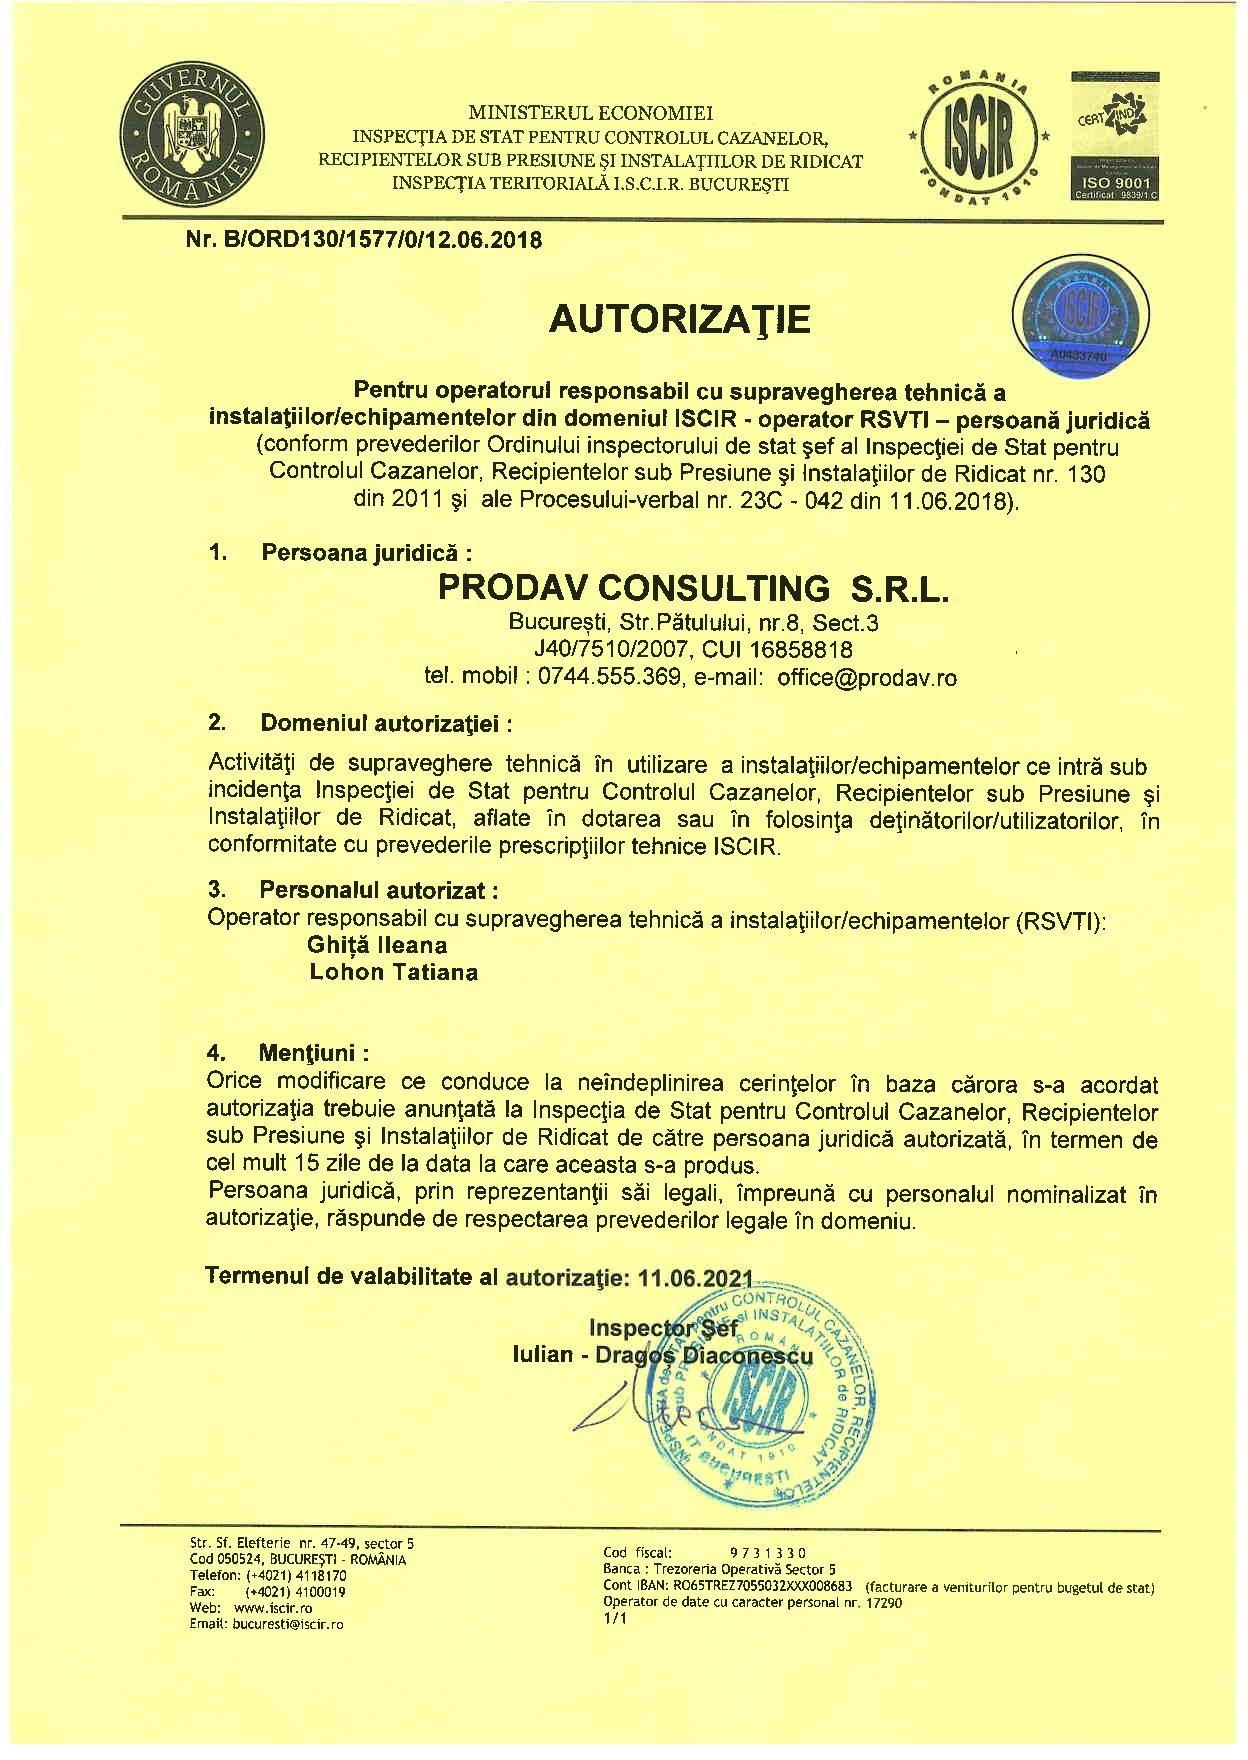 PRODAV CONSULTING - AUTORIZATIE OPERATOR RSVTI